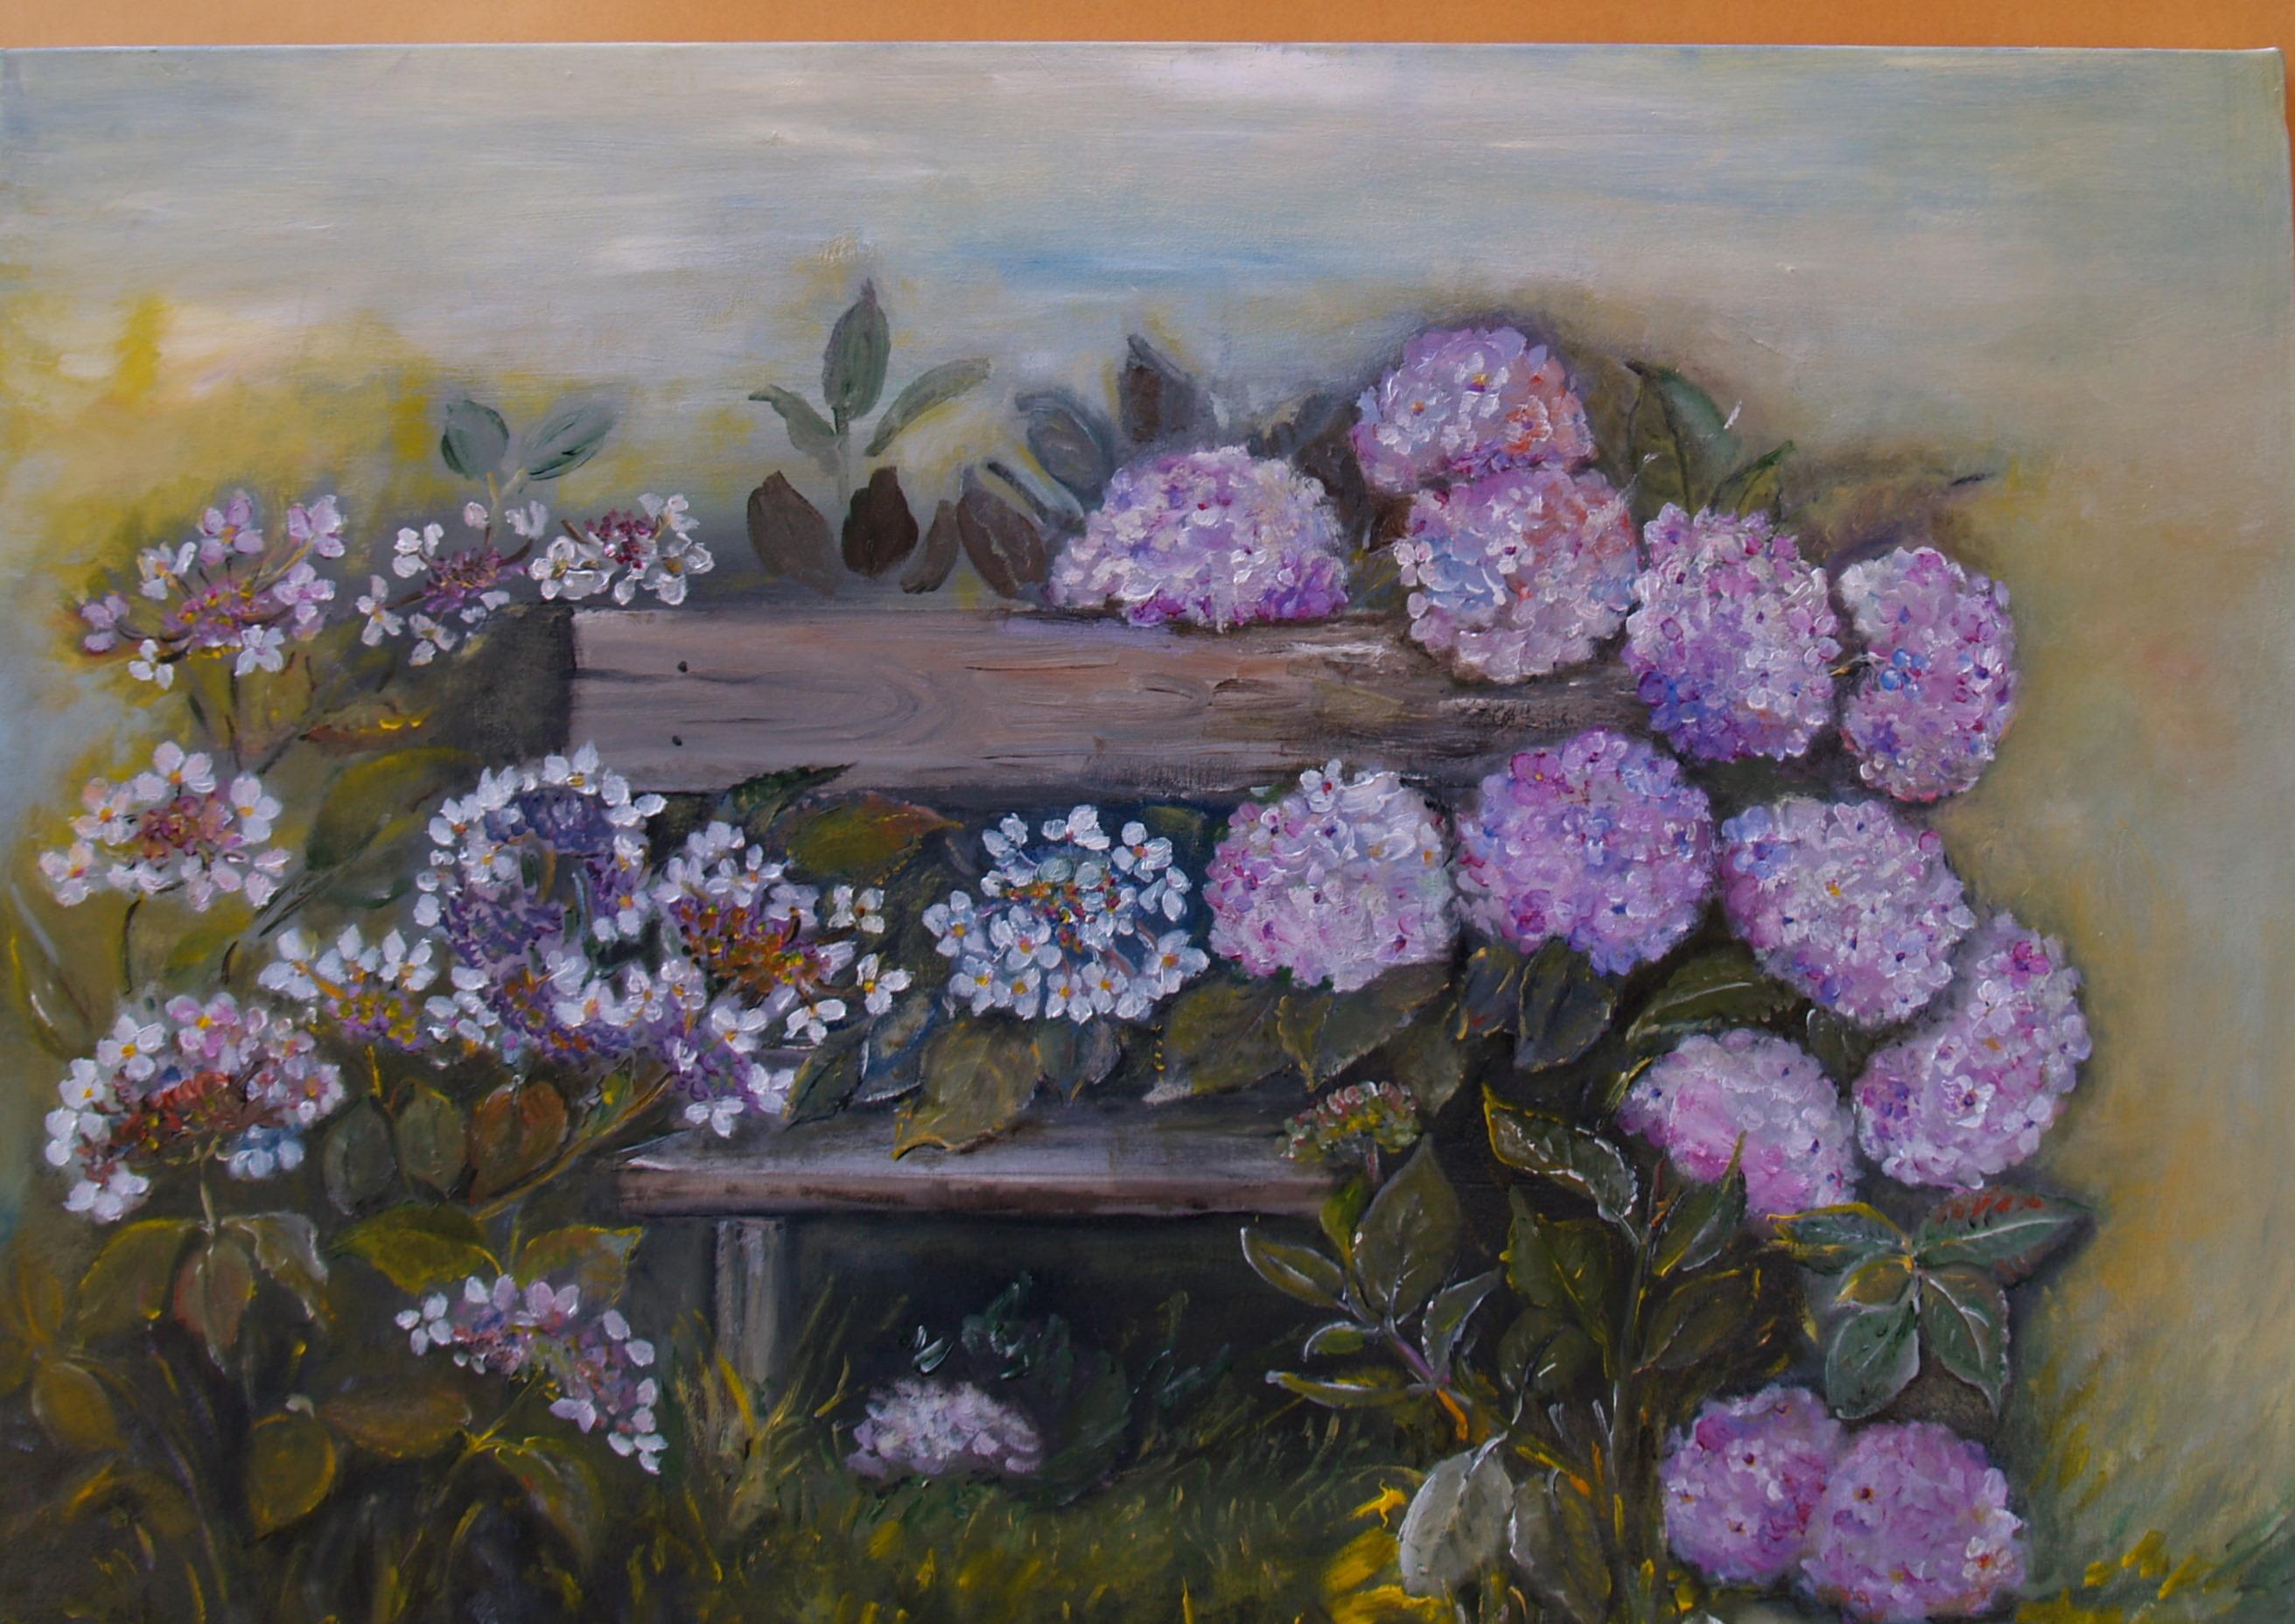 Quadri Con Ortensie : Quadri dipinti ortensie e piante